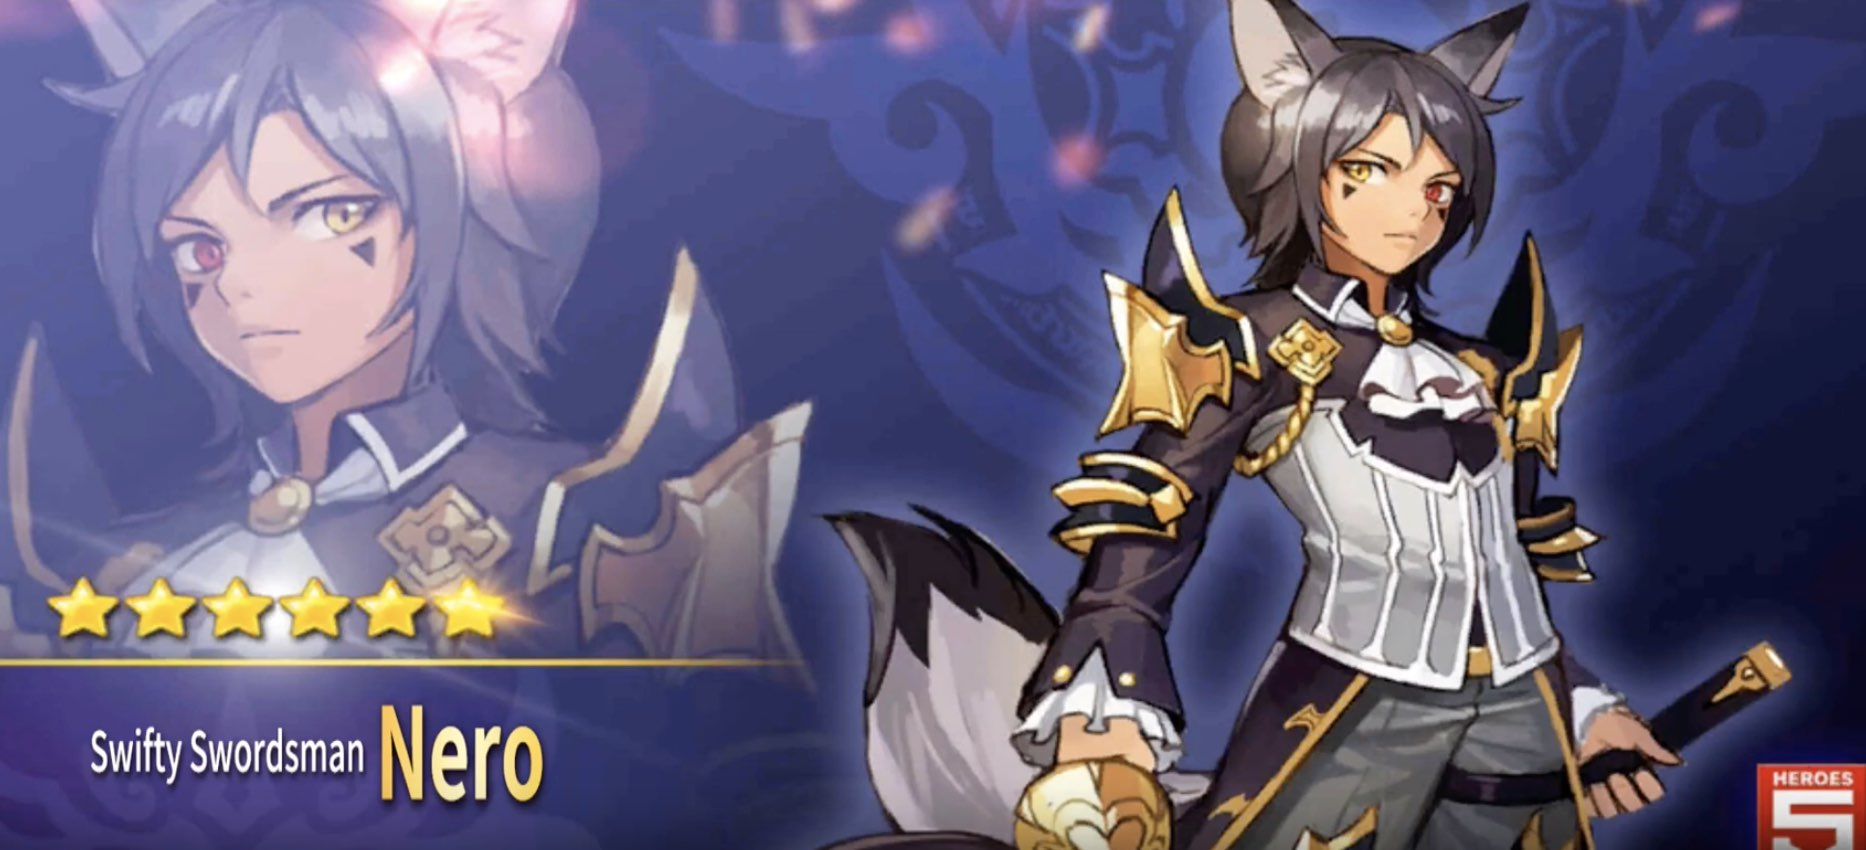 Heroes 5 wiki